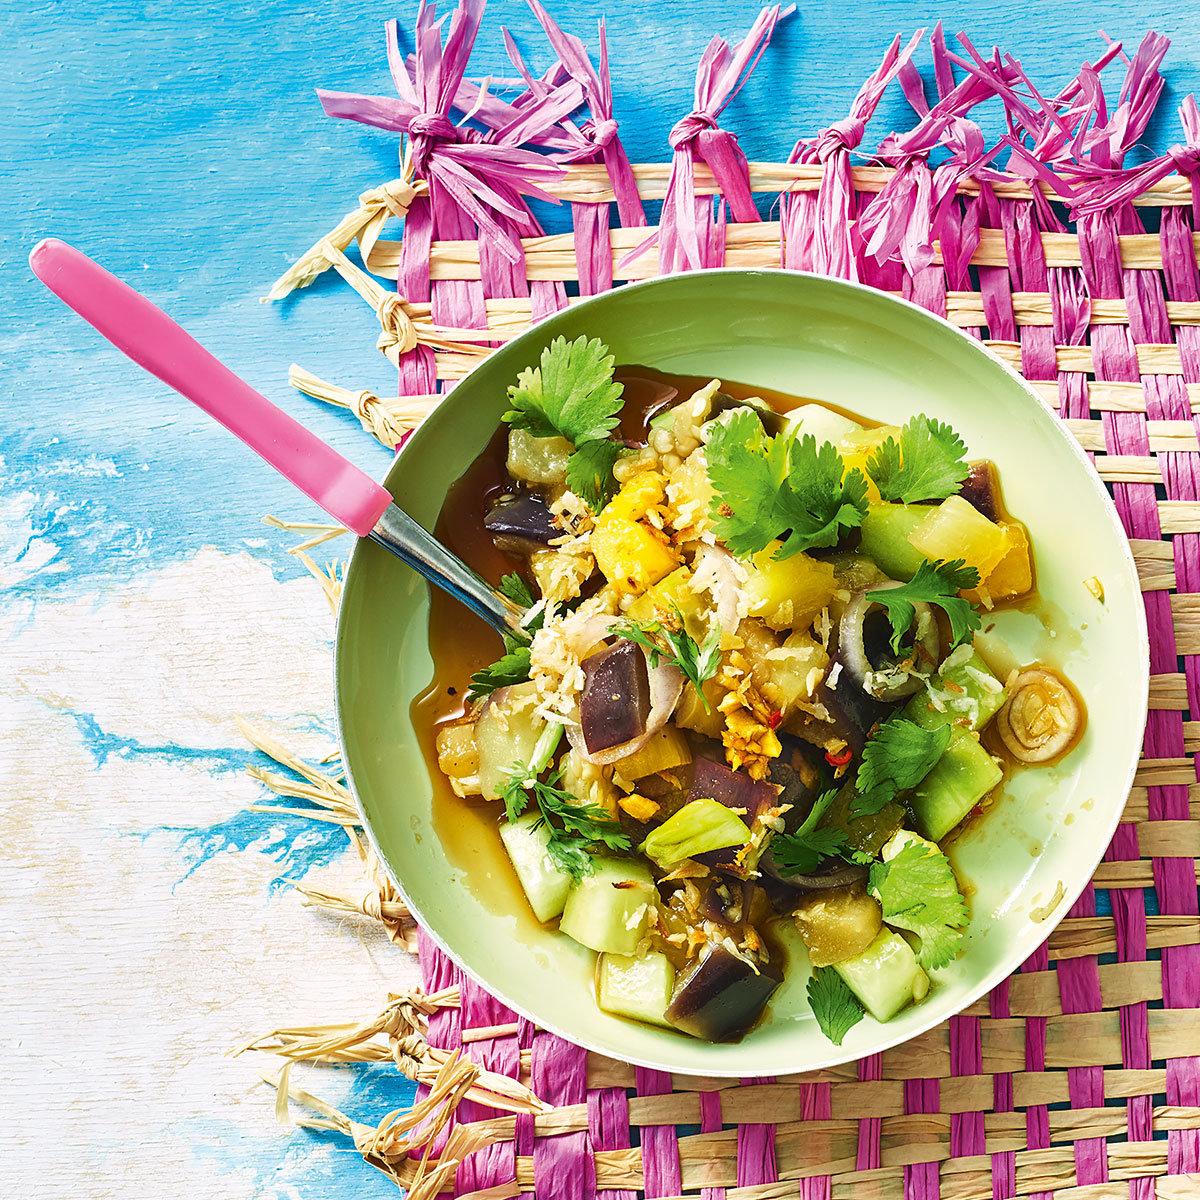 Rezept von aus Pacific Food: Auberginen-Ananas-Salat mit Kokos ...